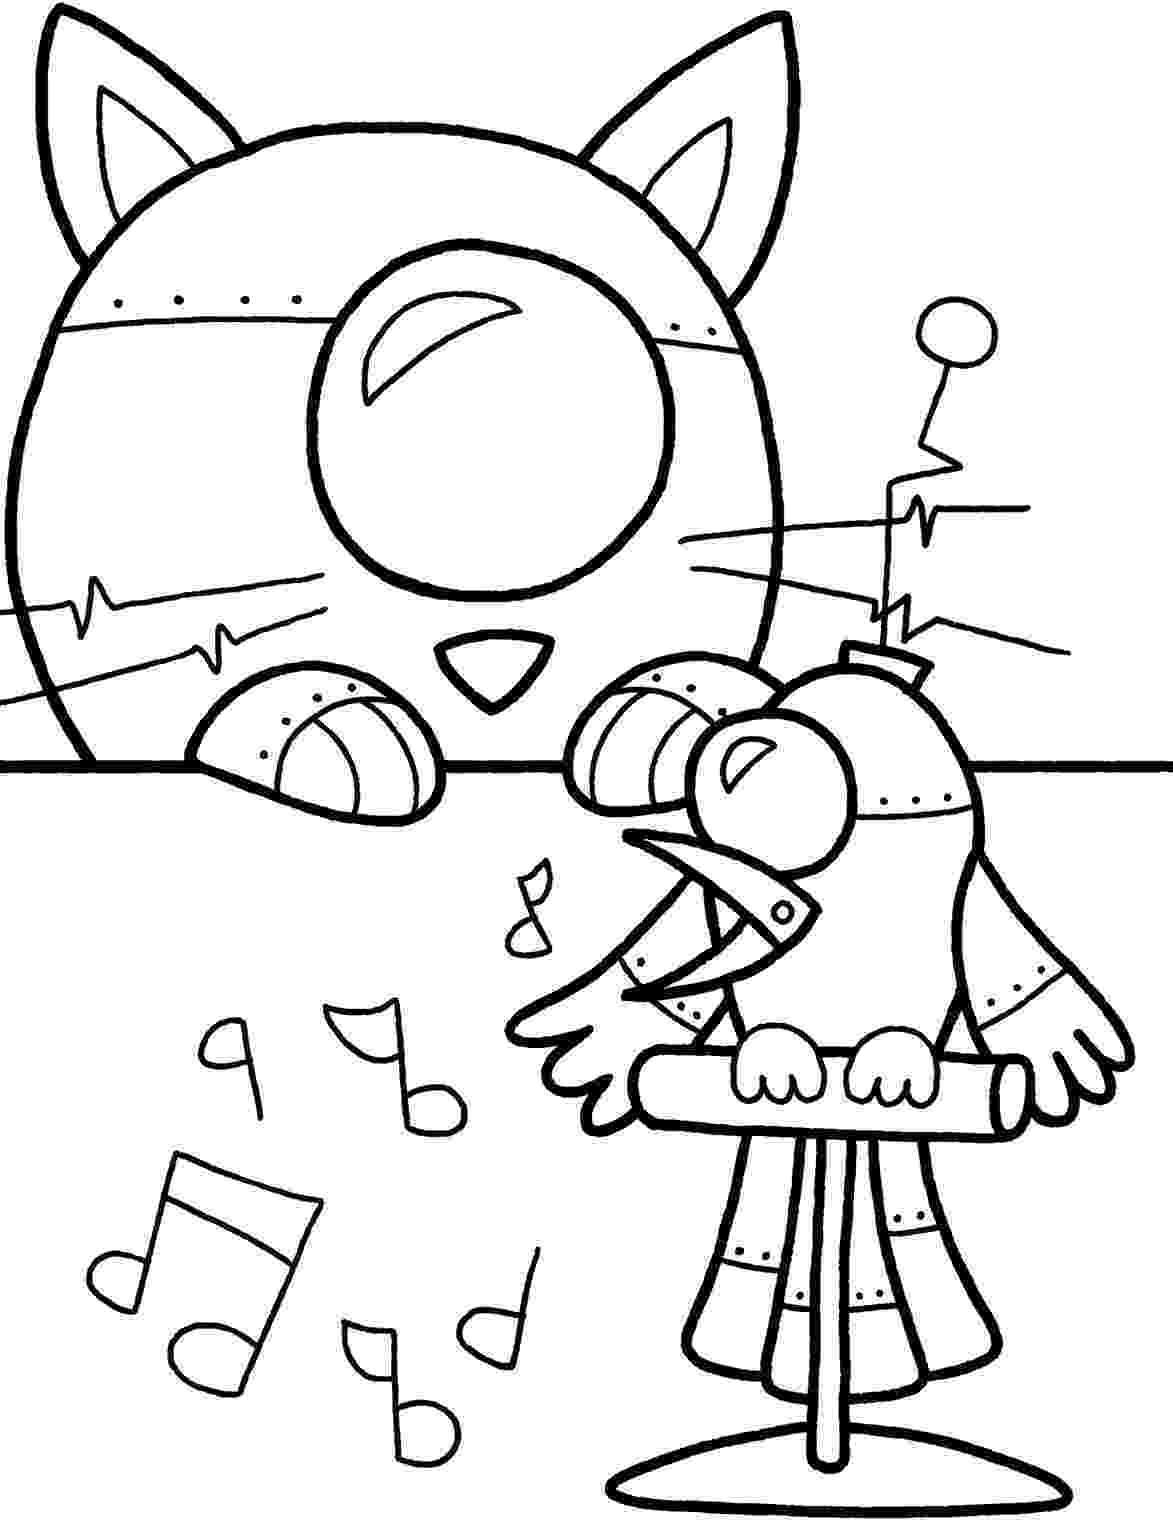 robots coloring pages belajar mewarnai versi anak cowok let39s learn pages robots coloring